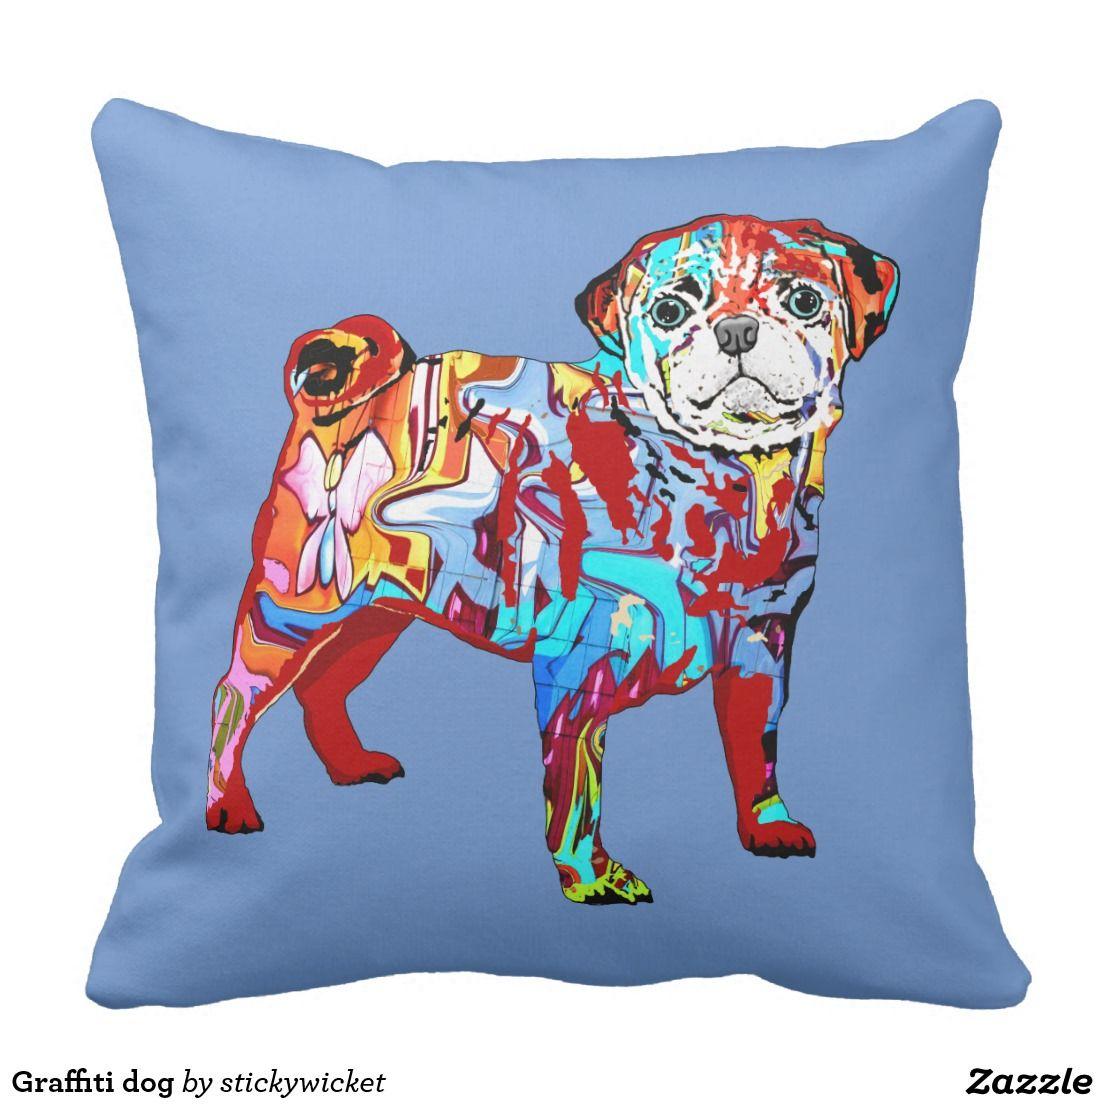 Graffiti dog throw pillow | Graffiti, Dogs and Throw pillows